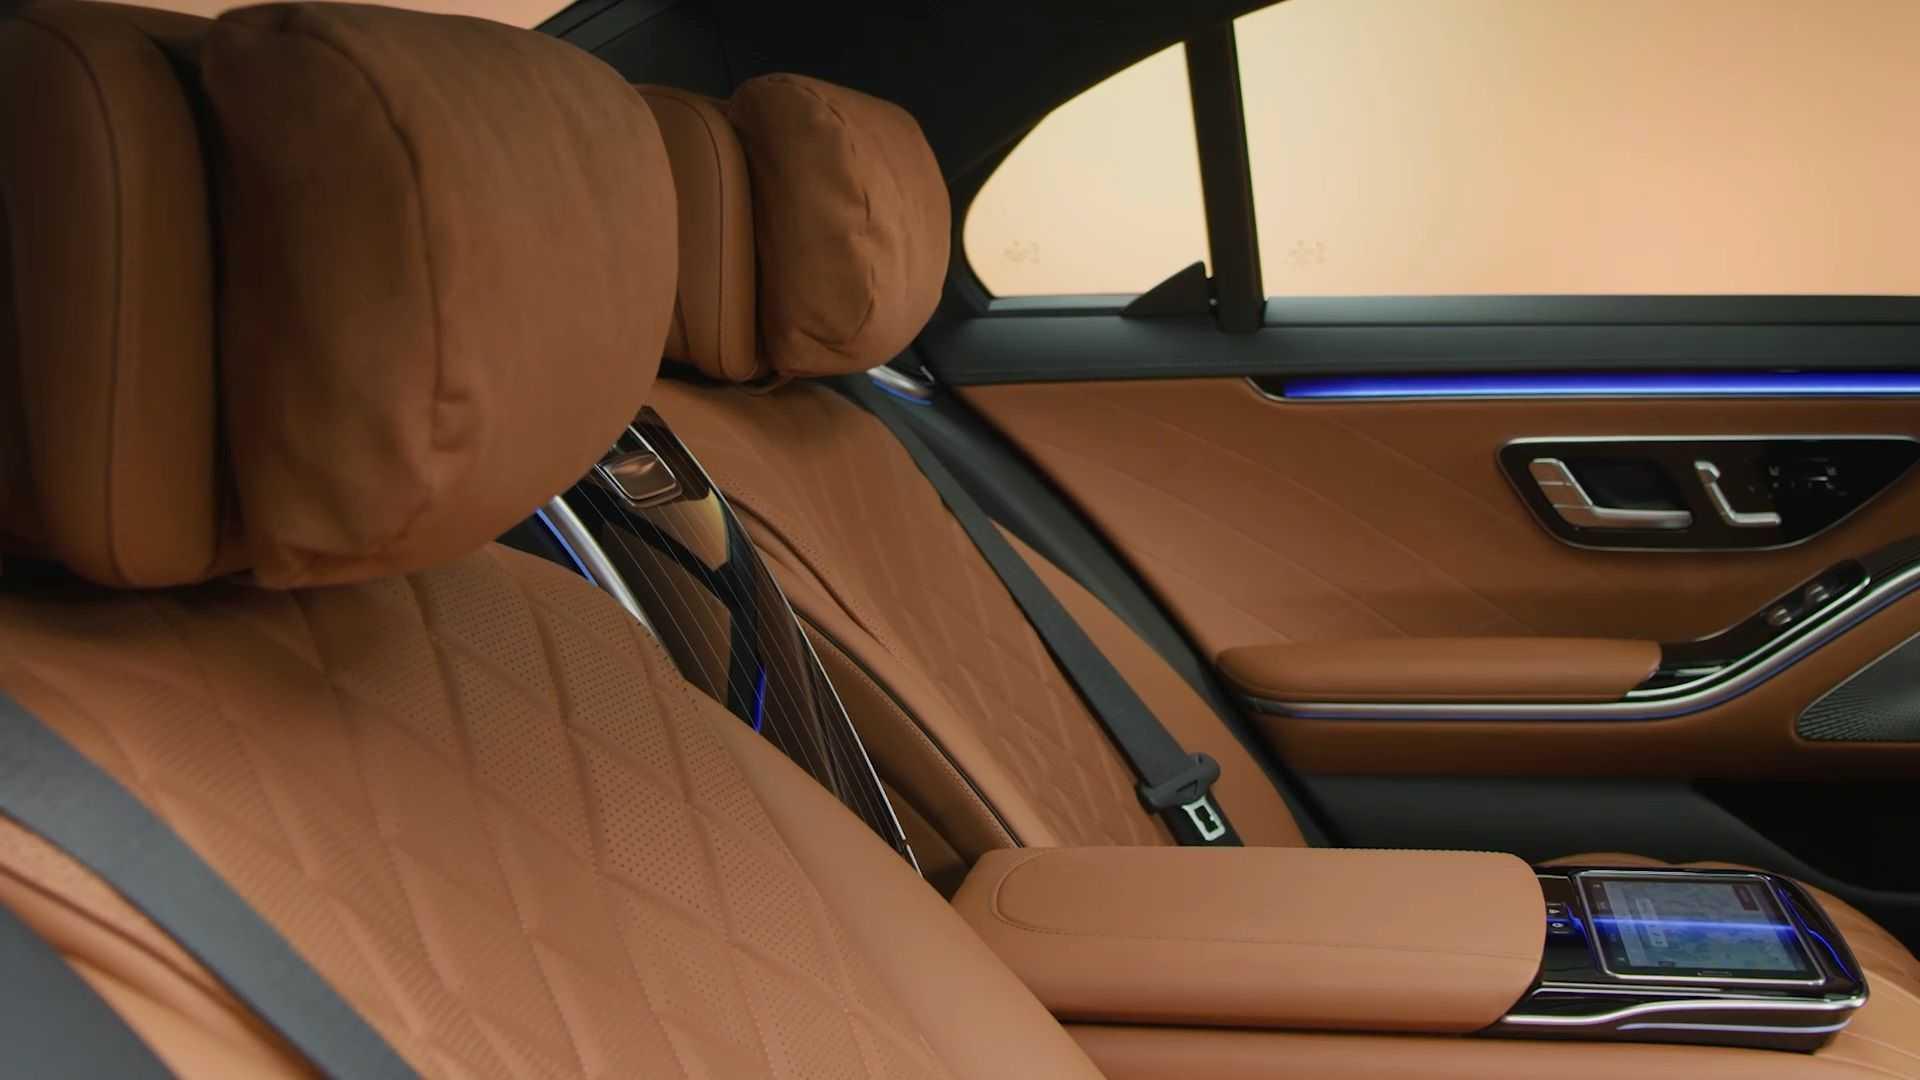 2021-mercedes-s-class-interior-1